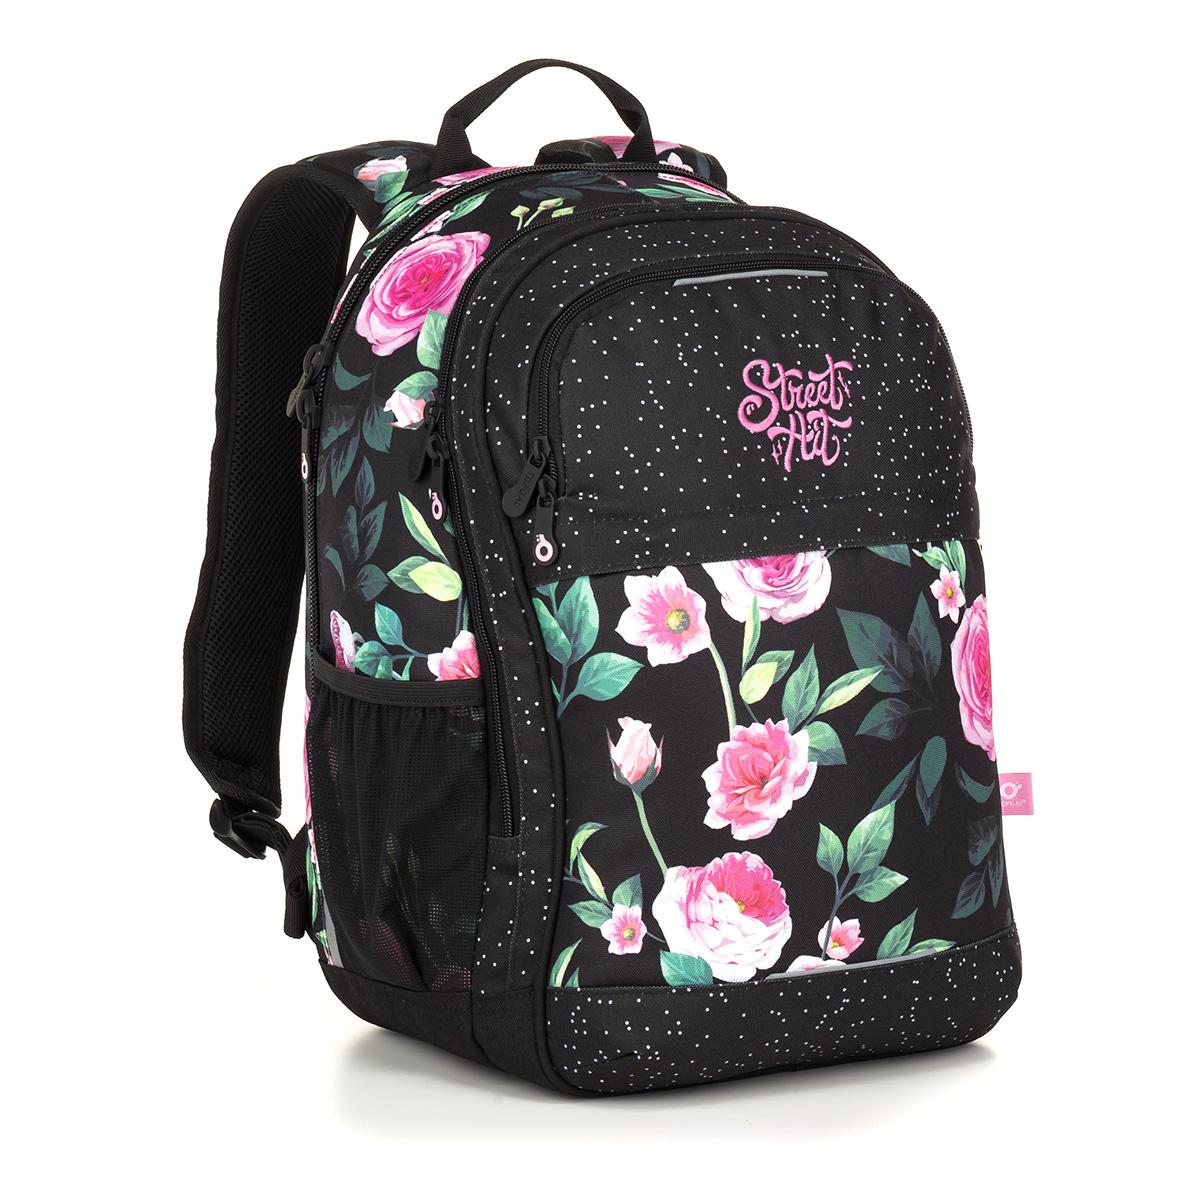 Študentský batoh Topgal RUBI 18025 G